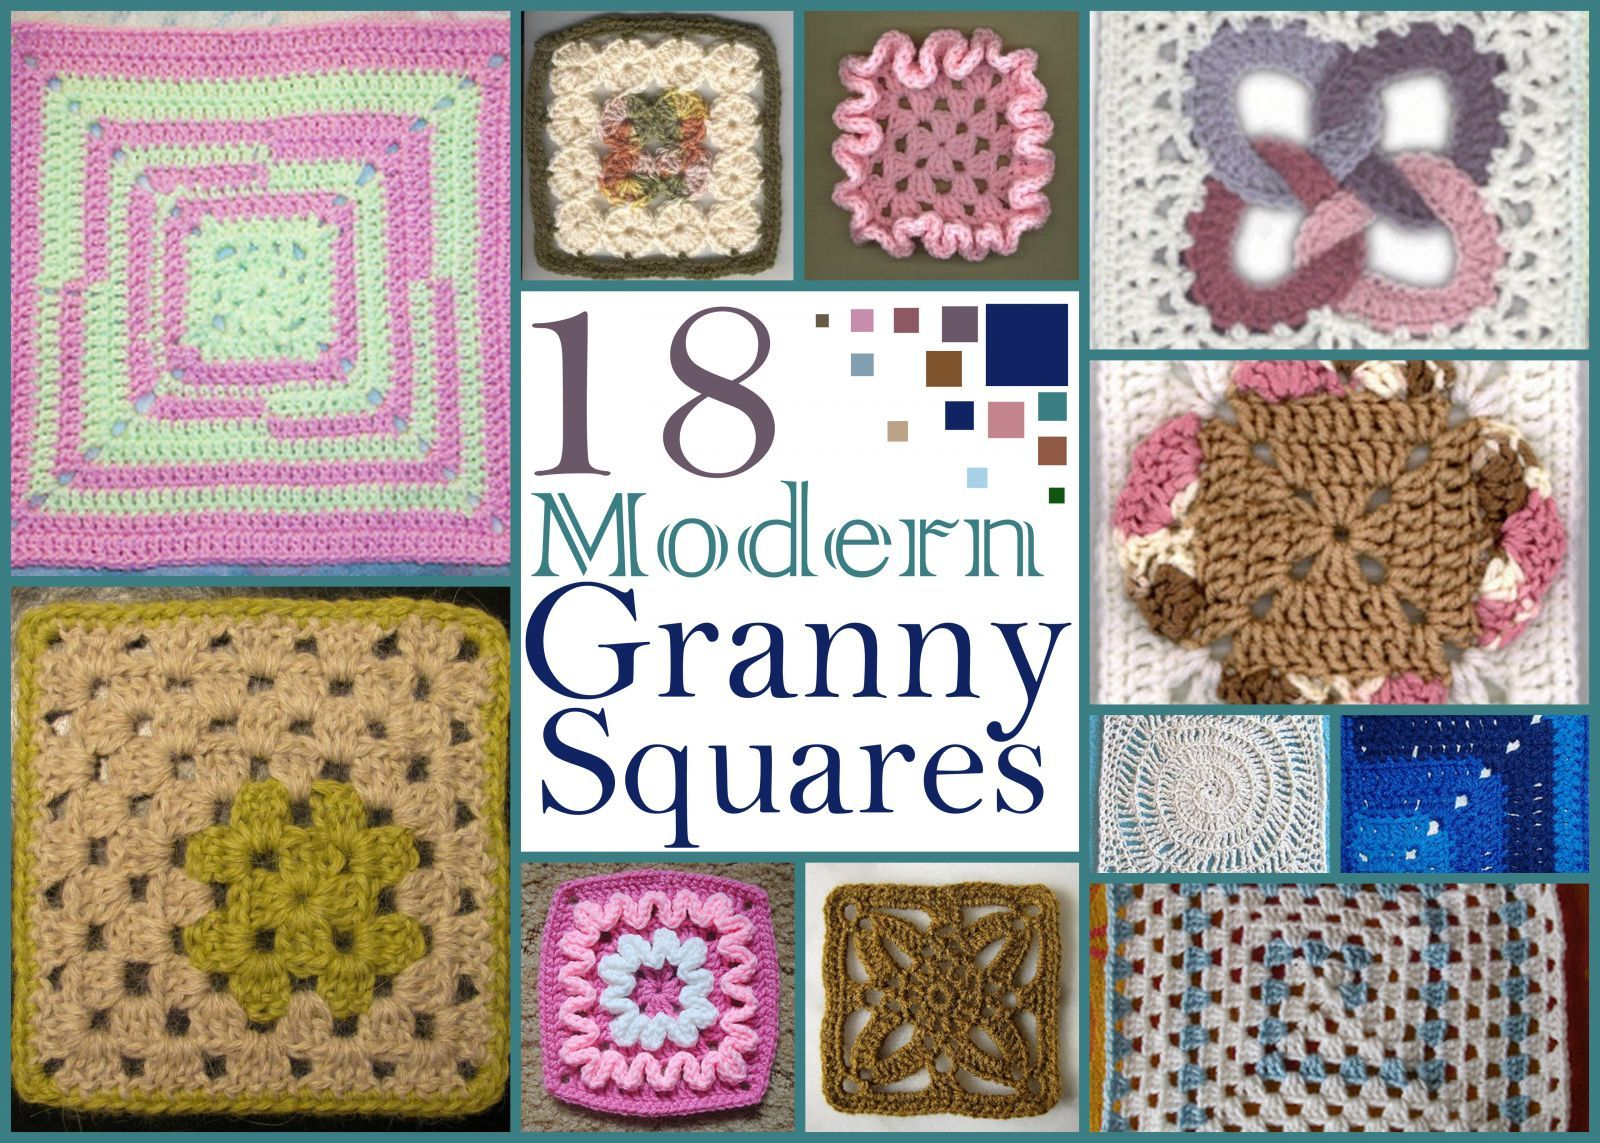 18 Modern Granny Squares | Cuadritos en crochet | Pinterest ...